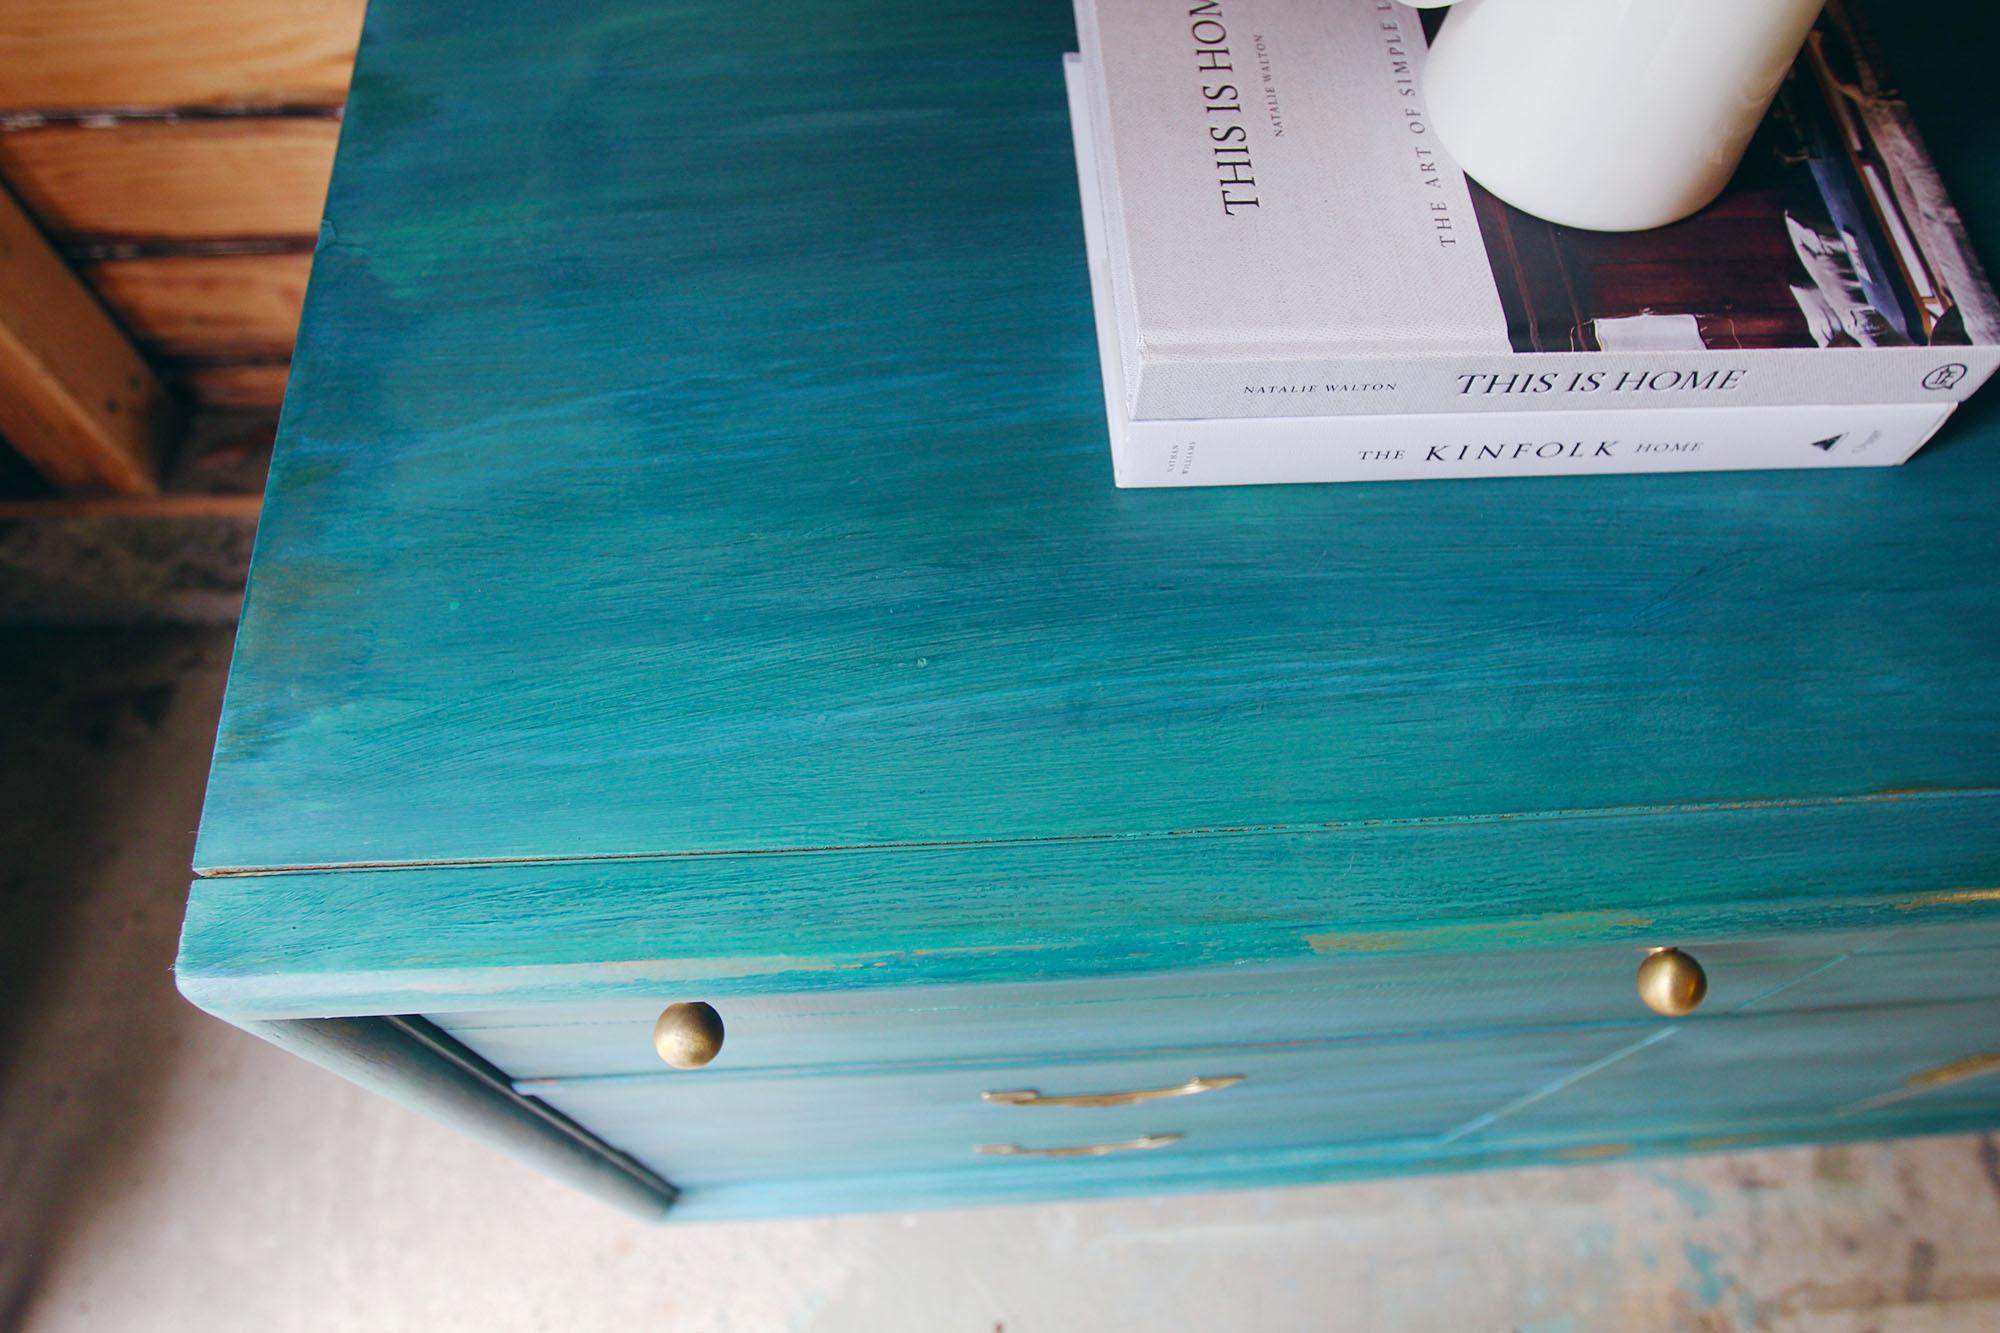 a-simpler-design-annie-sloan-turquoise-teal-water-technique-jpg12.jpg